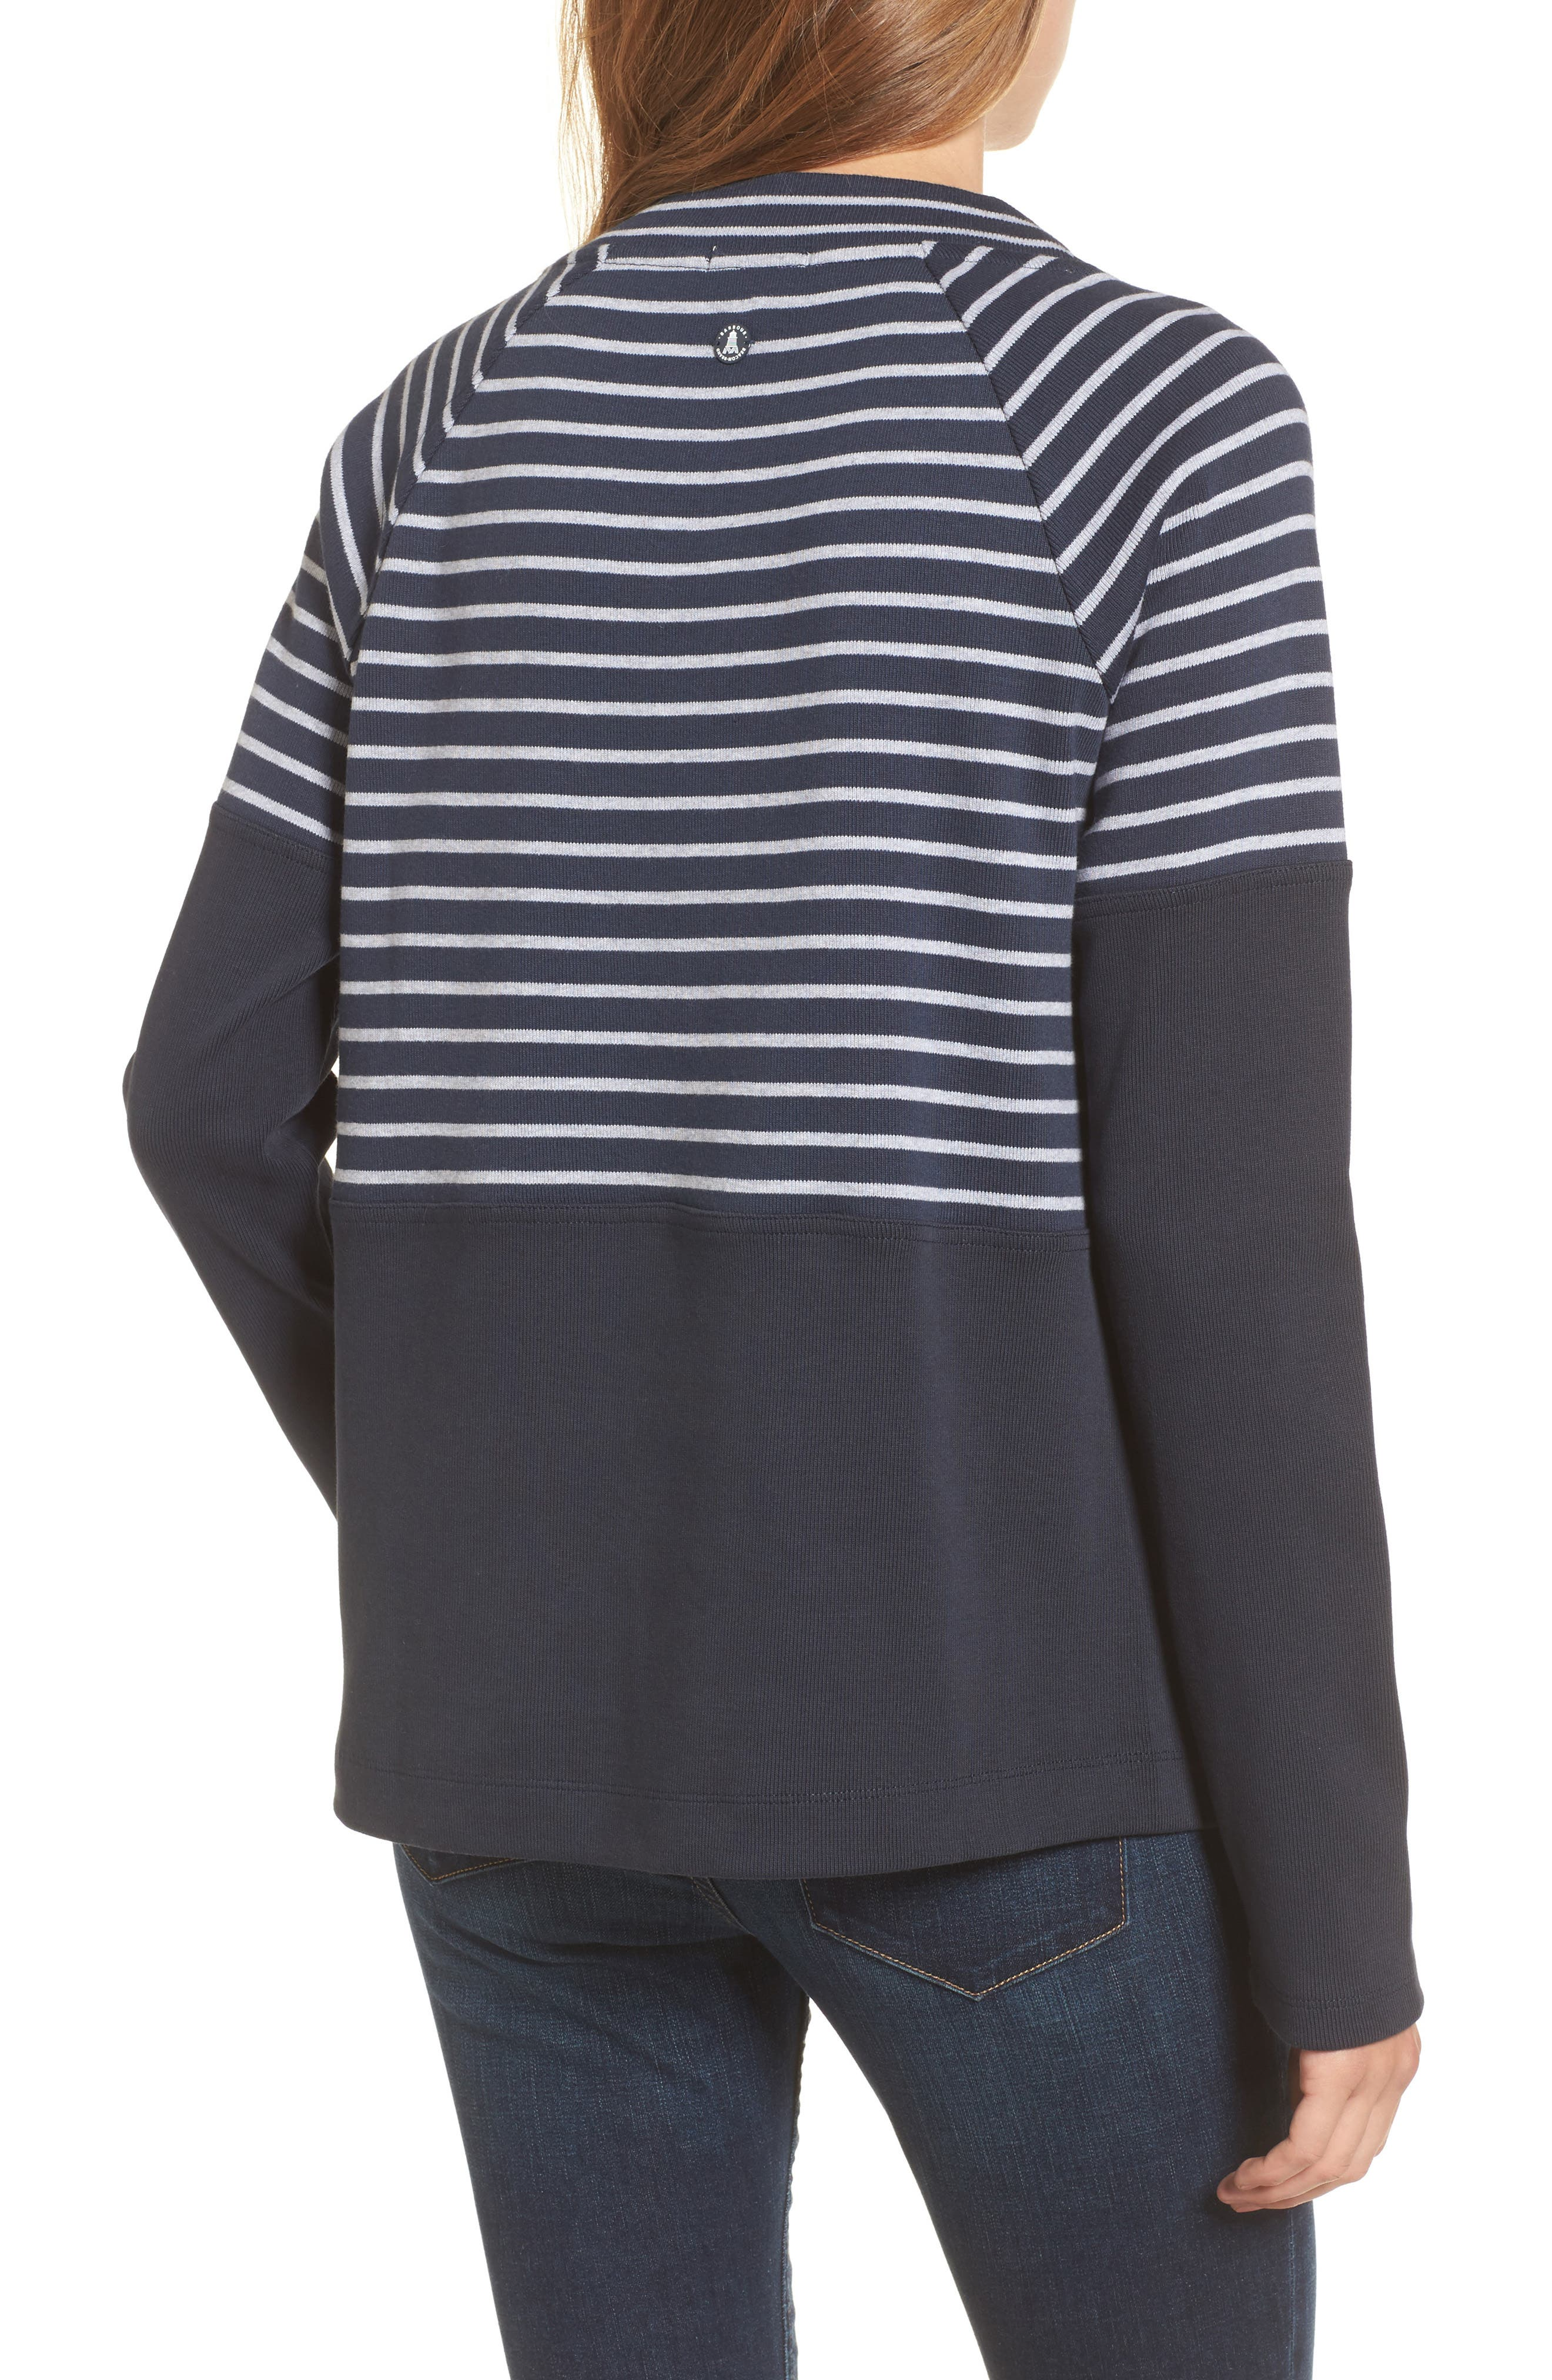 Seaburn Stripe Sweatshirt,                             Alternate thumbnail 2, color,                             Navy/ Grey